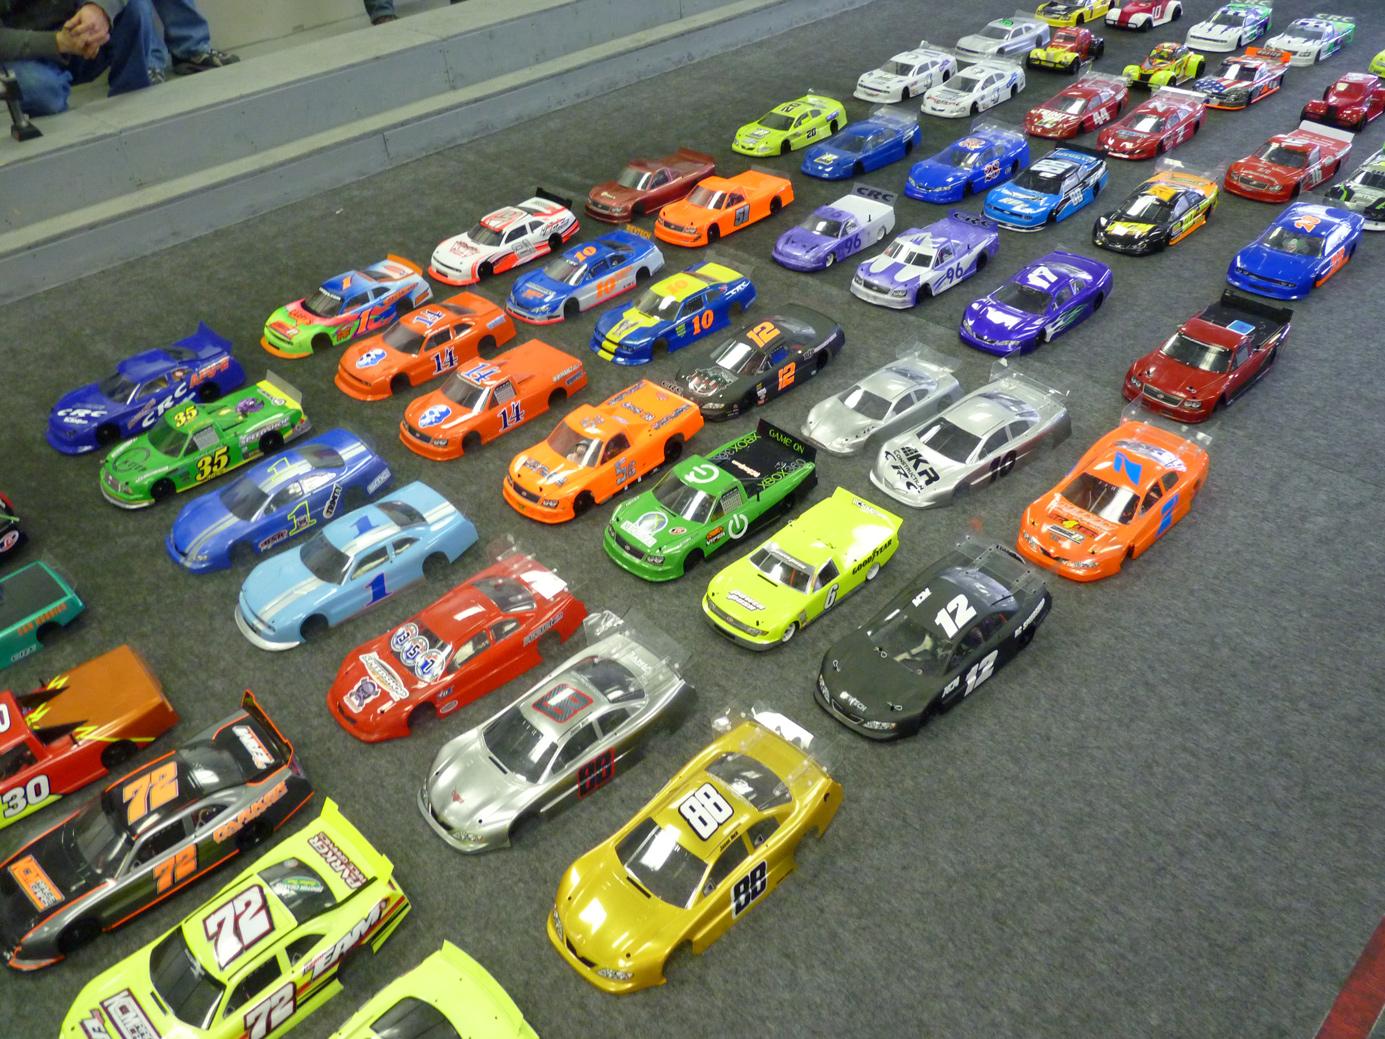 Cars R Us Sackville >> Carpet Racing Rc Cars - Carpet Vidalondon